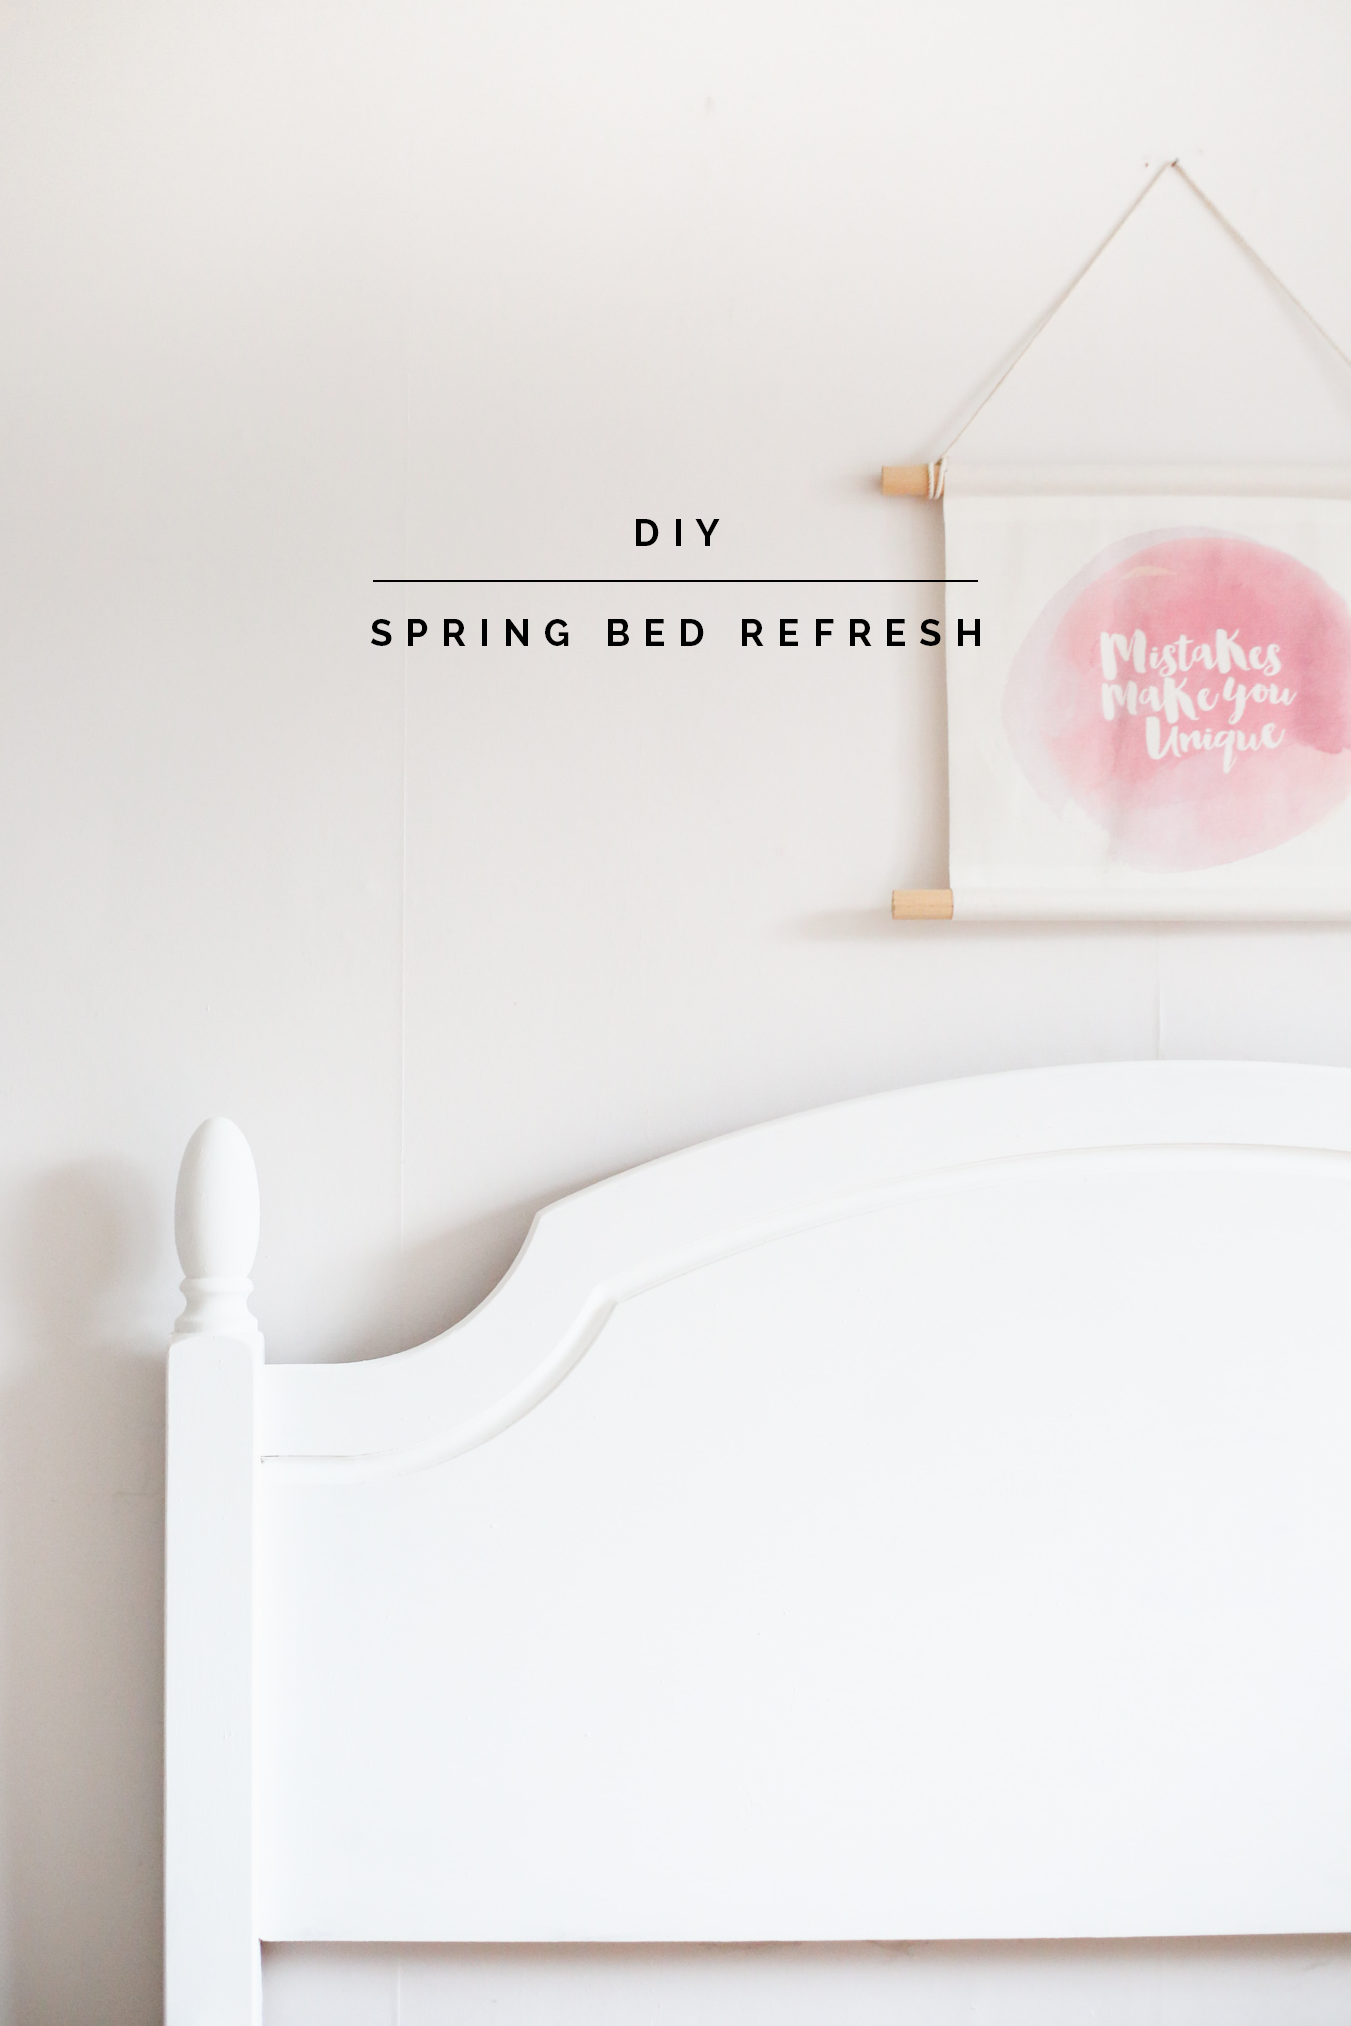 DIY Spring Bed Refresh | @fallfordiy